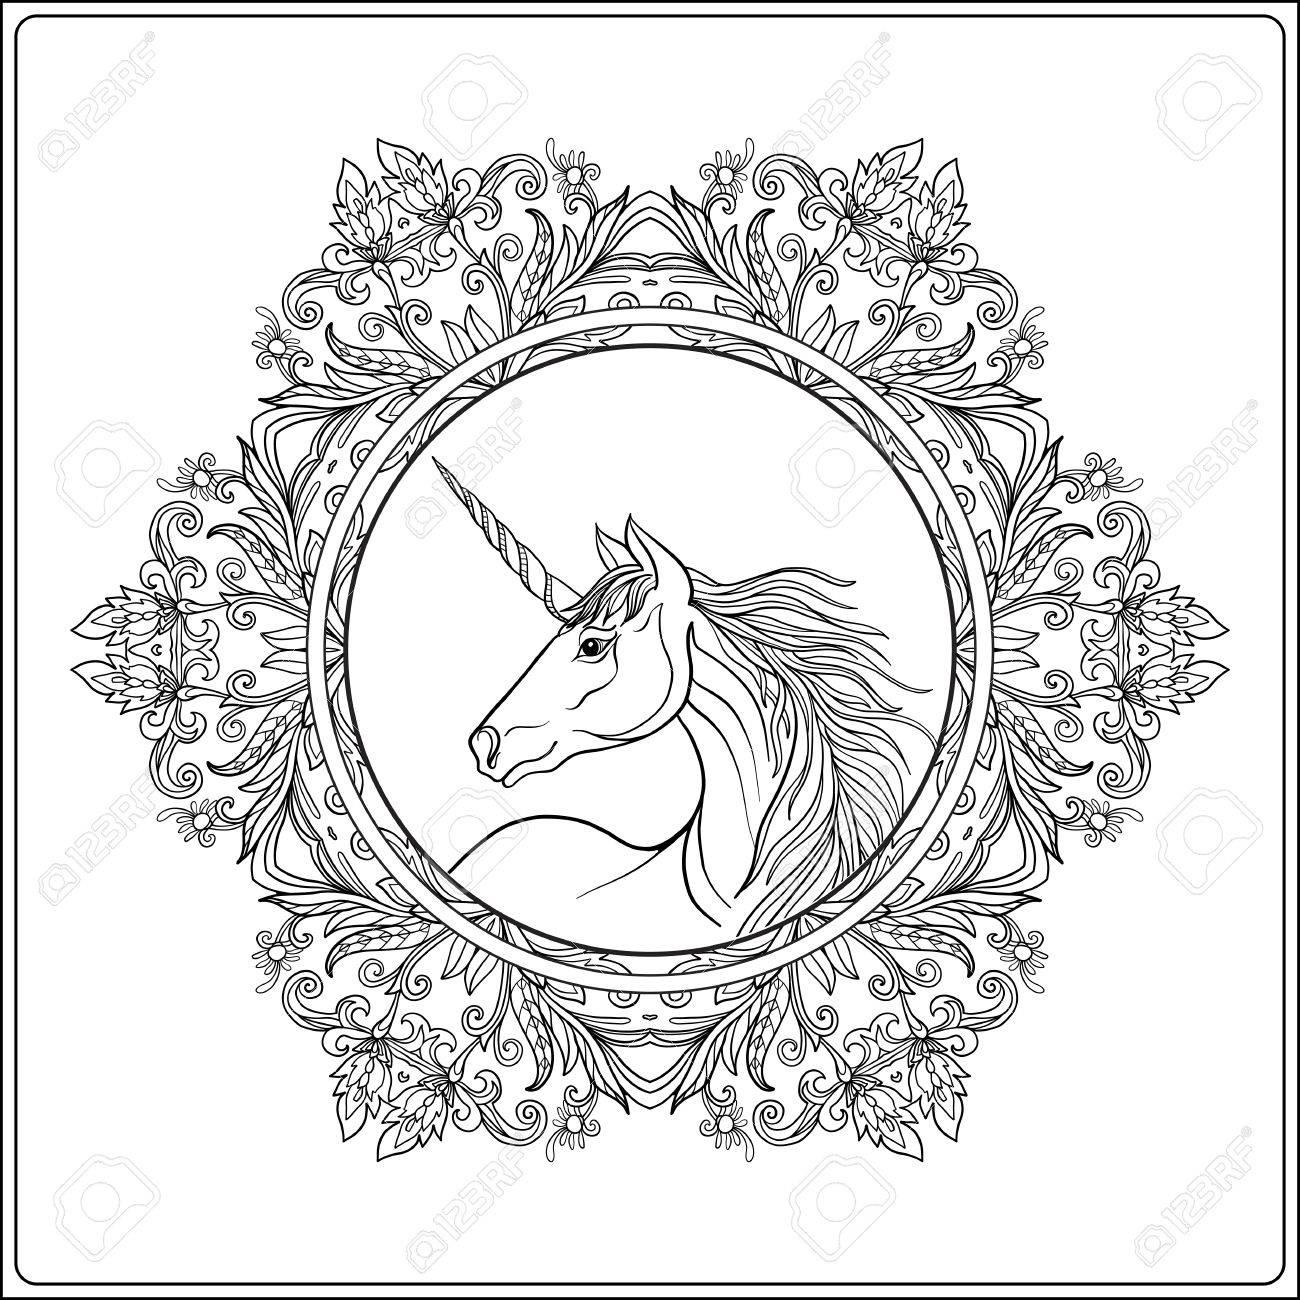 Unicorn In Vintage Decorative Floral Mandala Frame Vector Illustration Coloring Book For Adult And